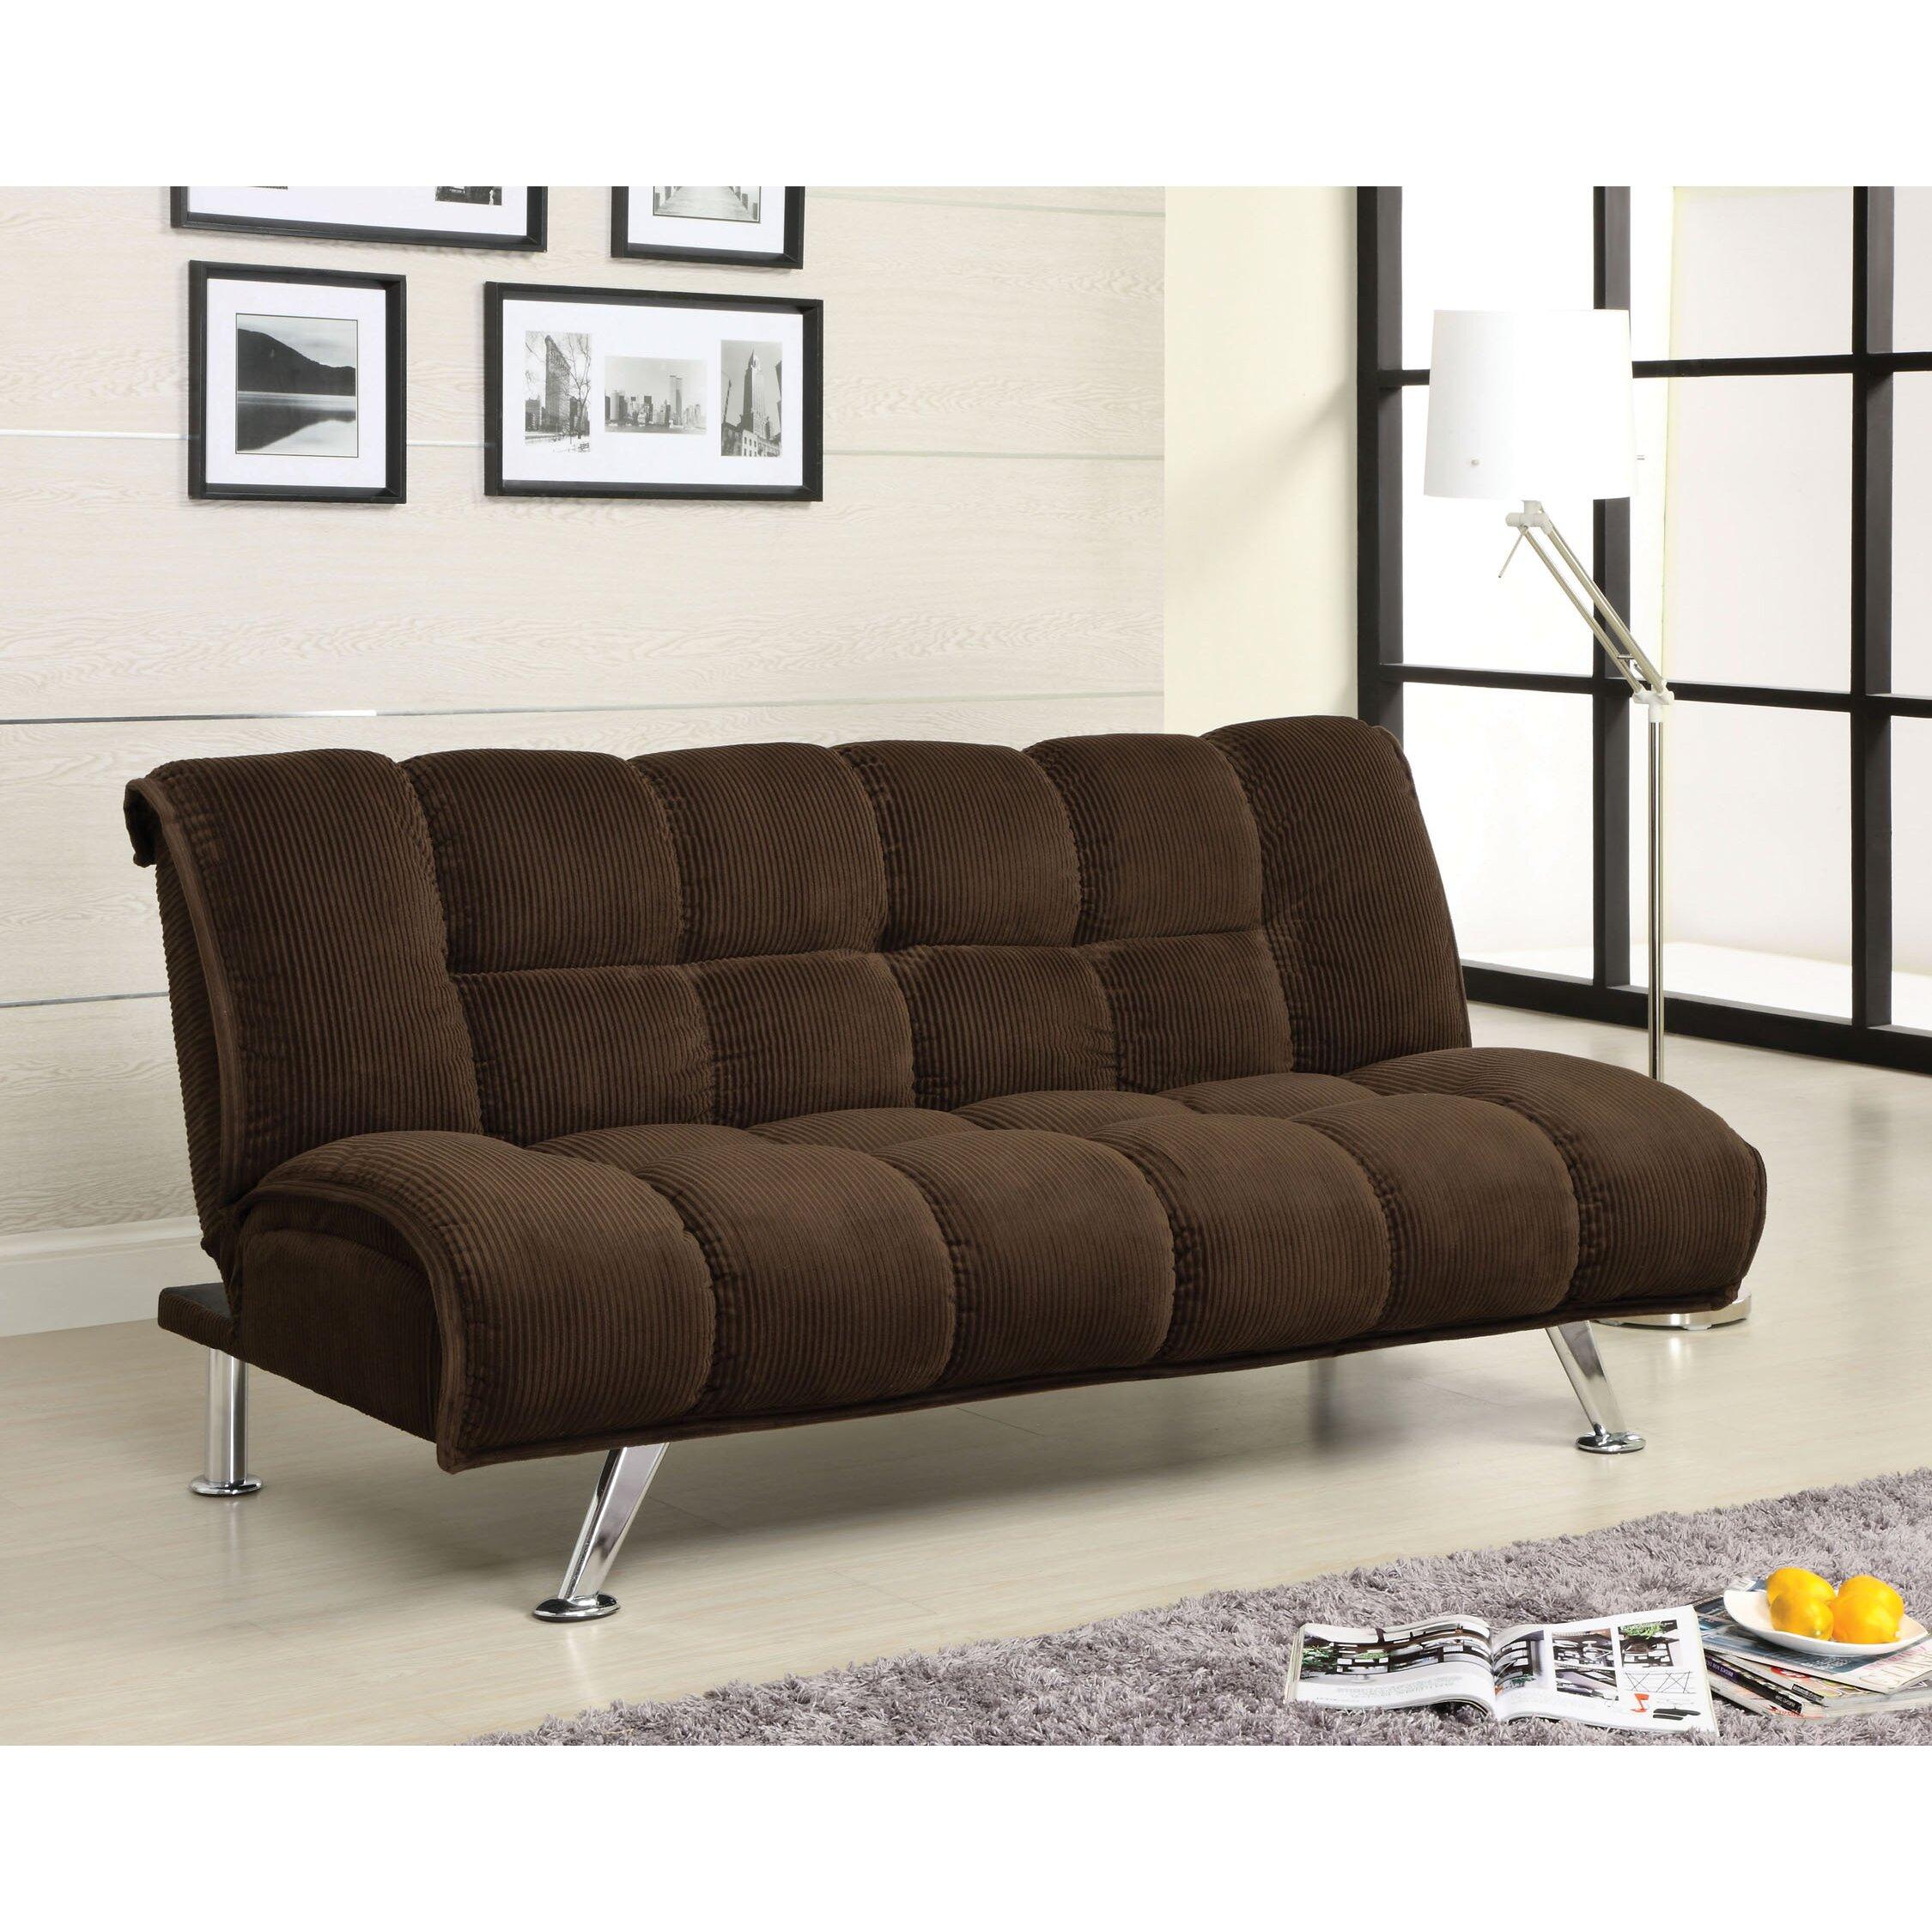 Hokku designs oberon living room collection reviews for Hokku designs living room furniture